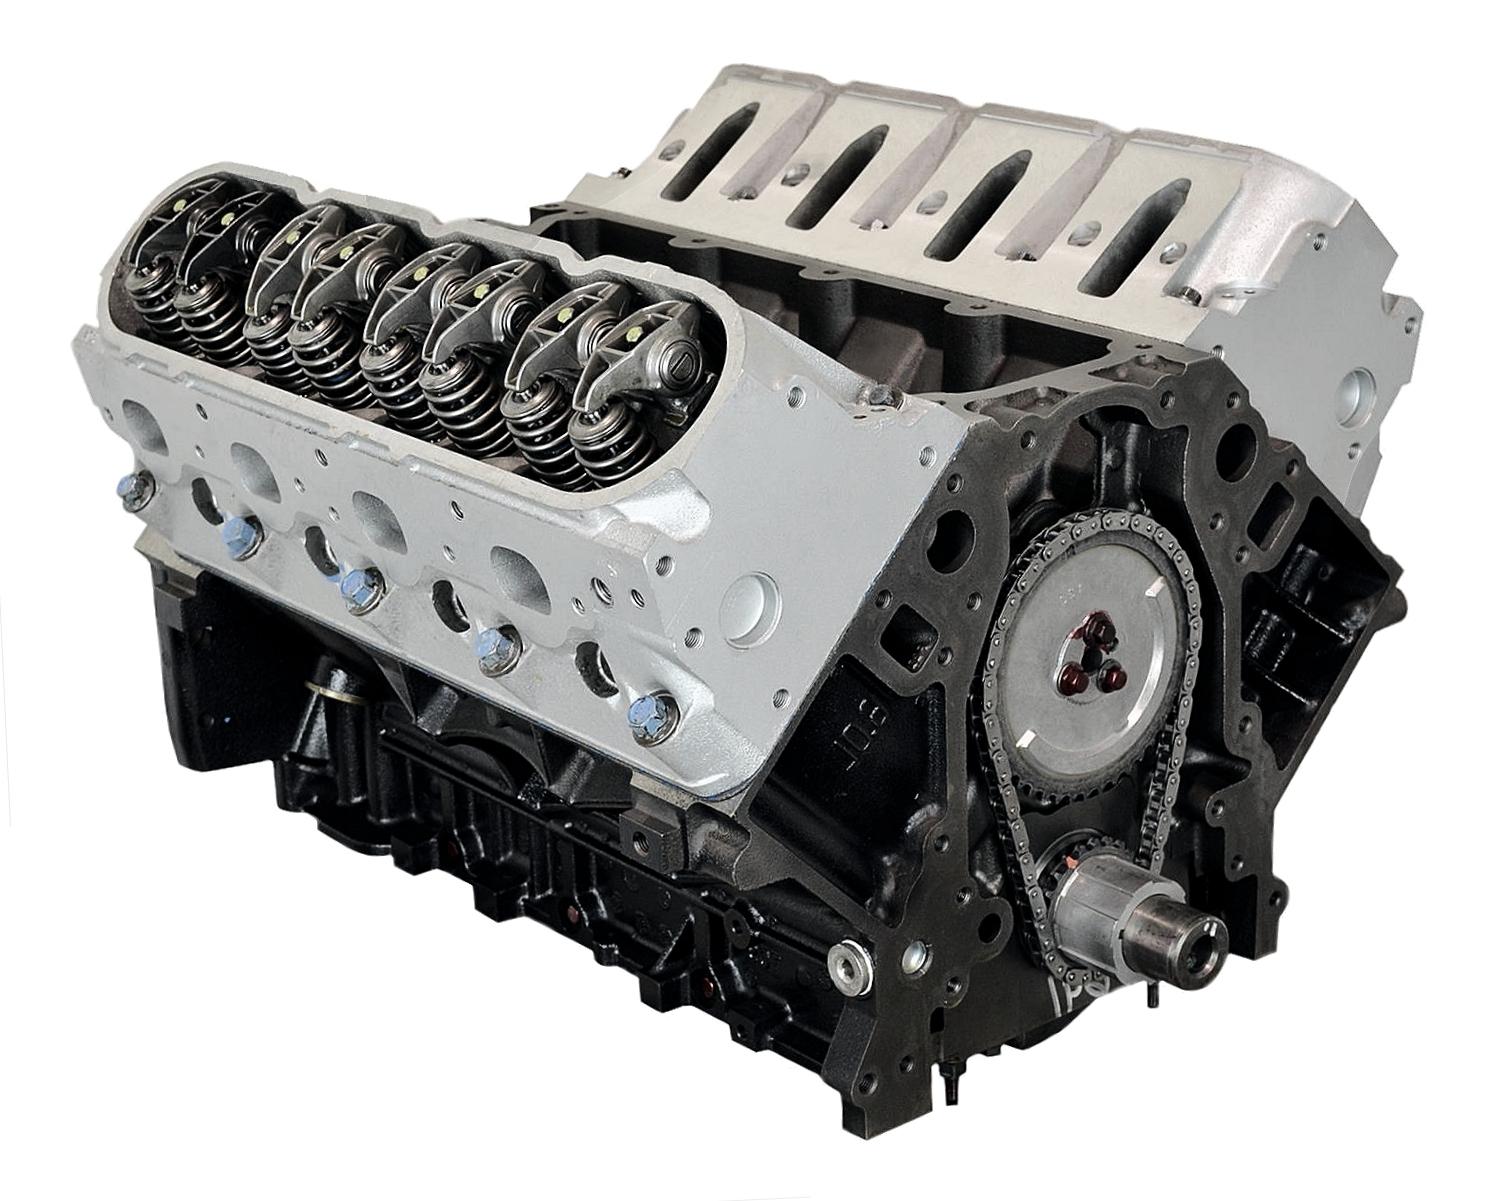 5.3 GM L59 Reman Long Block Engine Chevrolet Tahoe Vin Code: Z